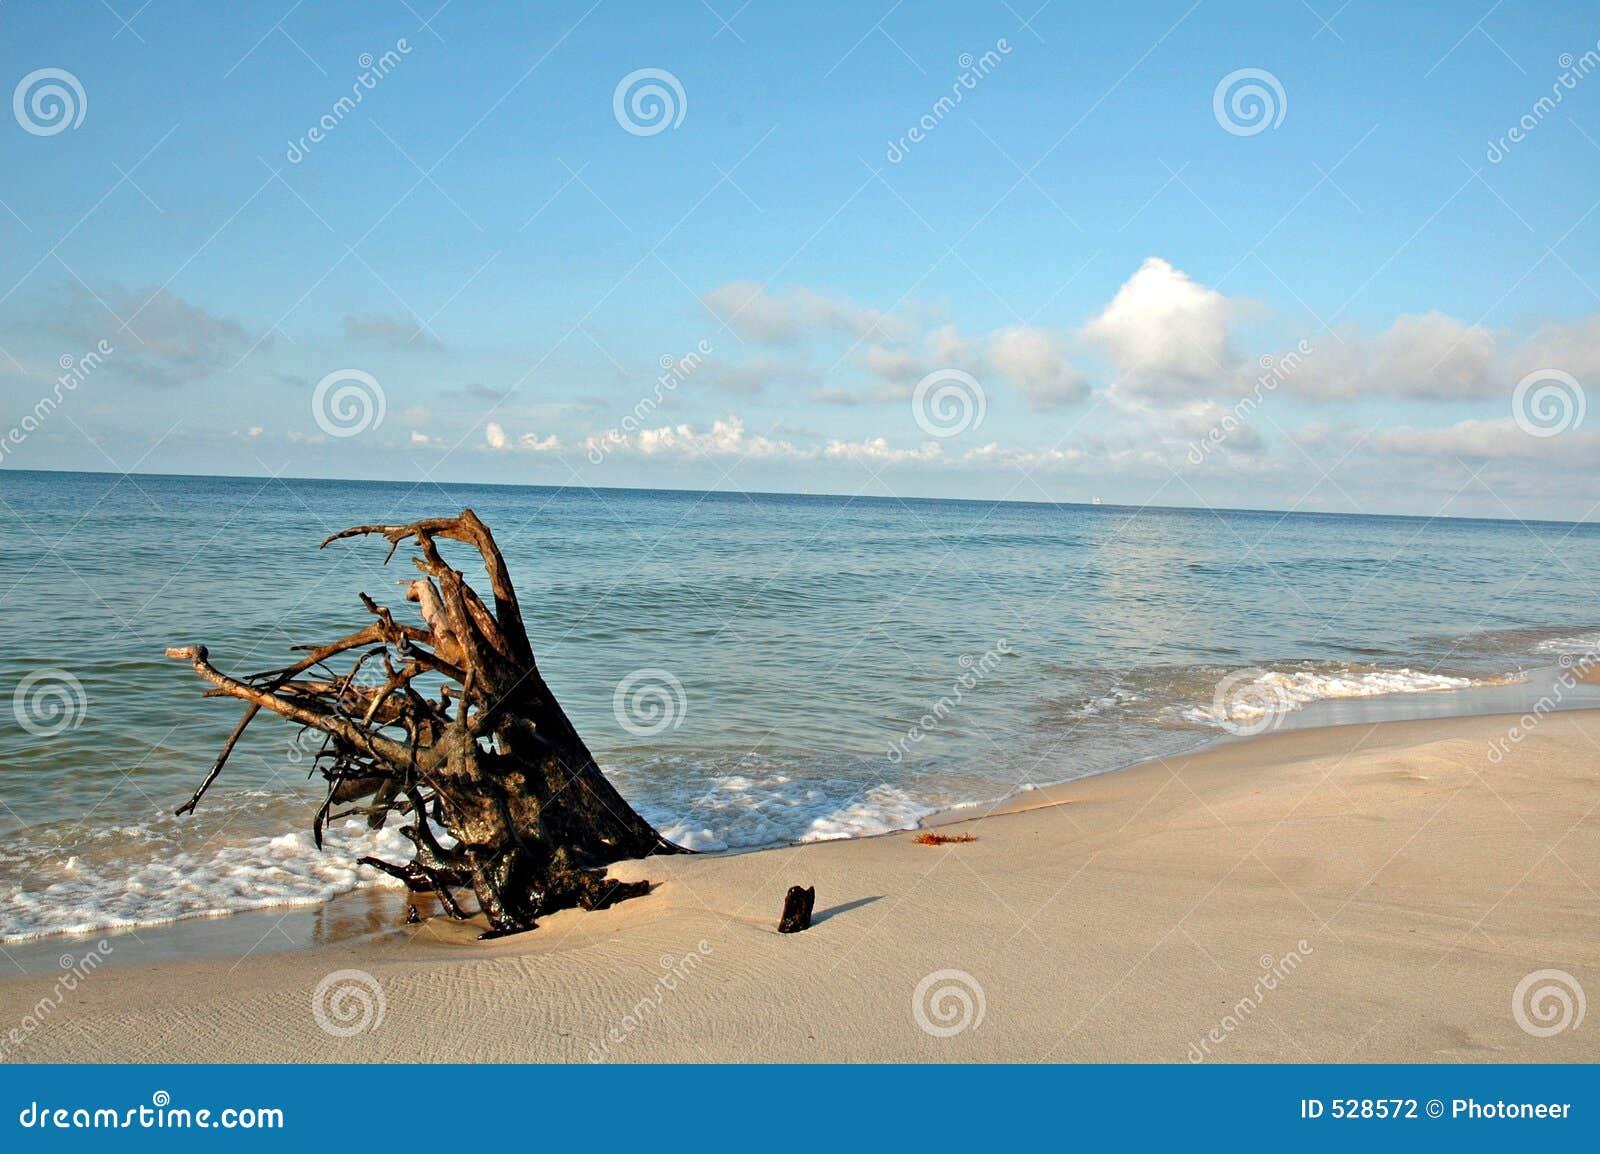 Download 海滩漂流木头 库存照片. 图片 包括有 天空, 云彩, 热带, 海运, 结构树, 海洋, 蓝色, 火箭筒, 沙子 - 528572